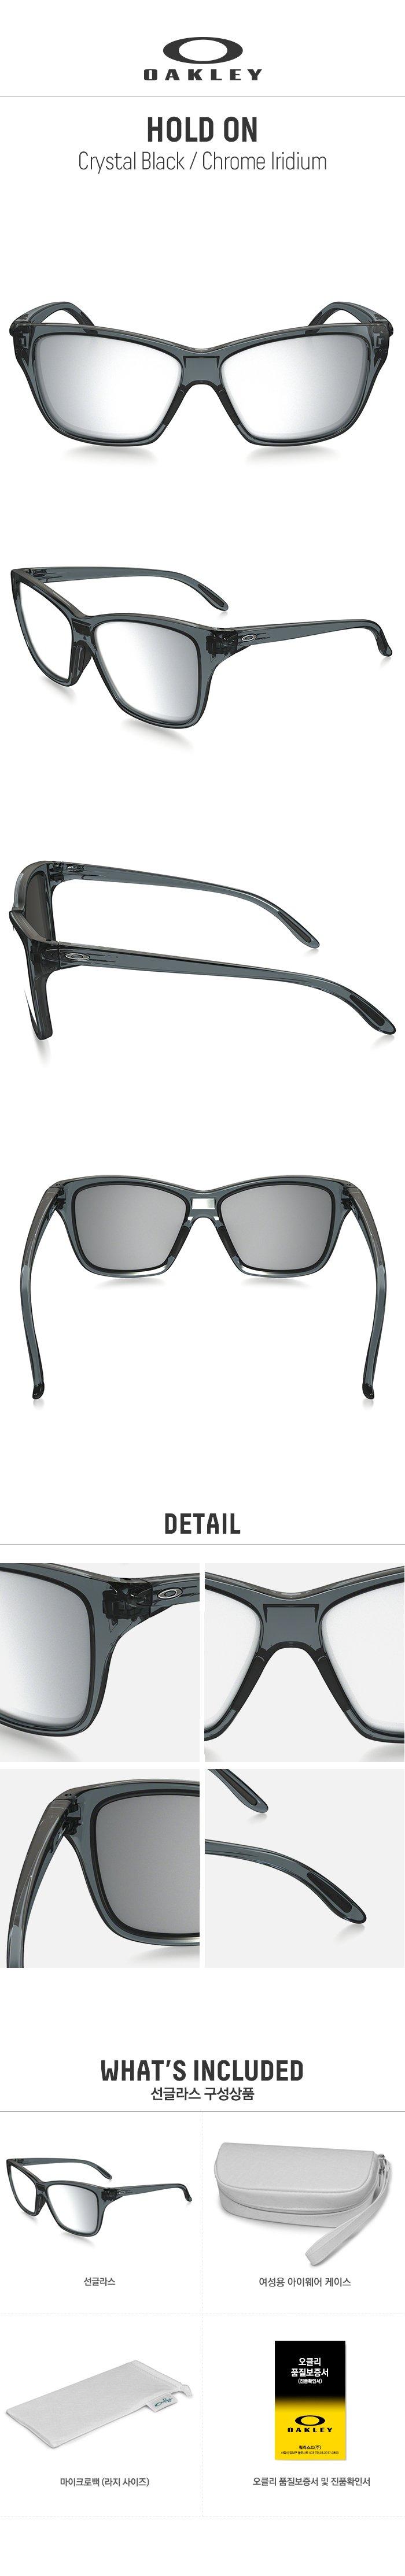 Oakley Hold On Crystal Black Chrome Iridium Oo9298 03 Sunglass Frogskins Prizm Oo 9245 74 Grey Smoke